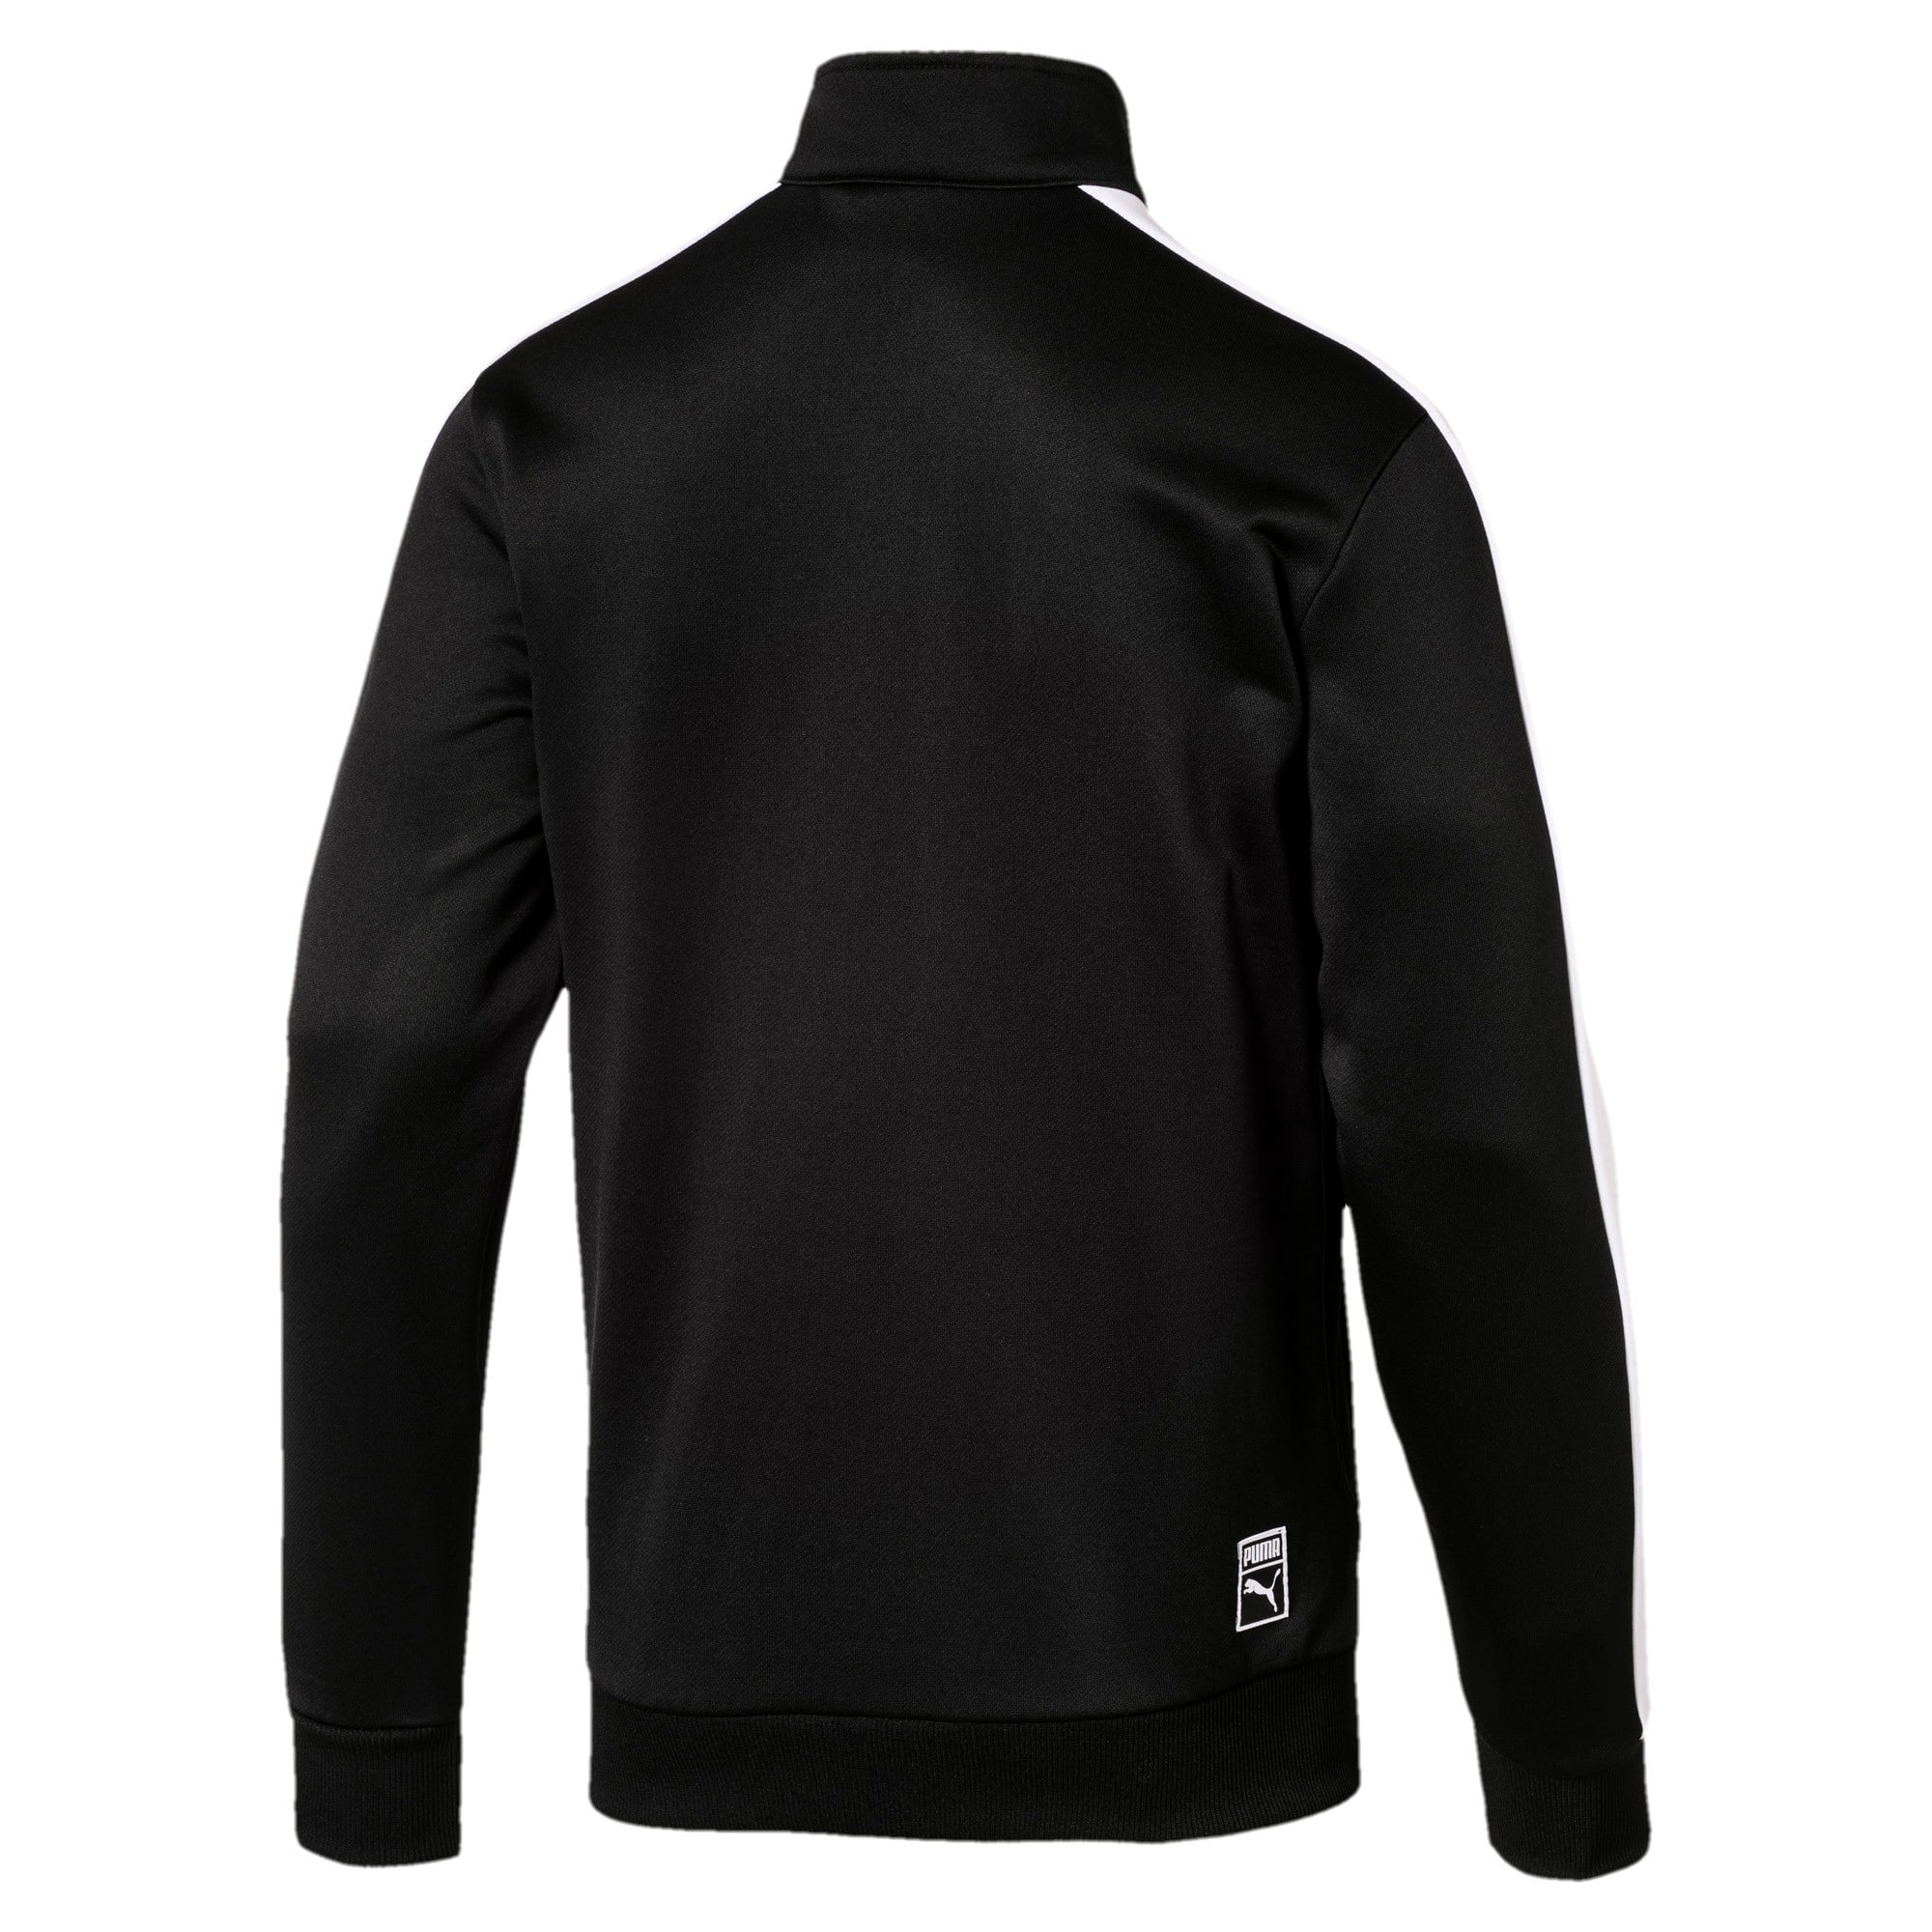 Thumbnail 5 of Archive Men's T7 Track Jacket, Puma Black, medium-IND